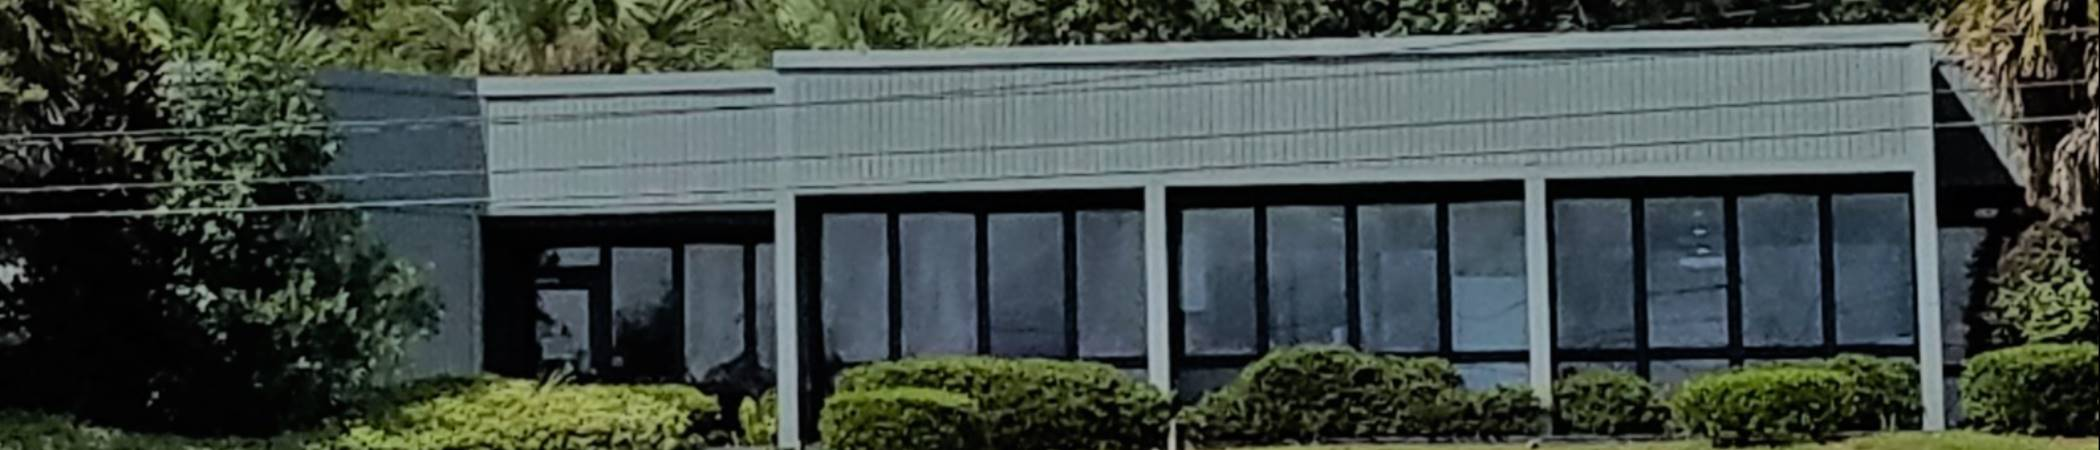 Vicki Catsimpiris State Farm Insurance in Tallahassee, FL | Home, Auto Insurance & more